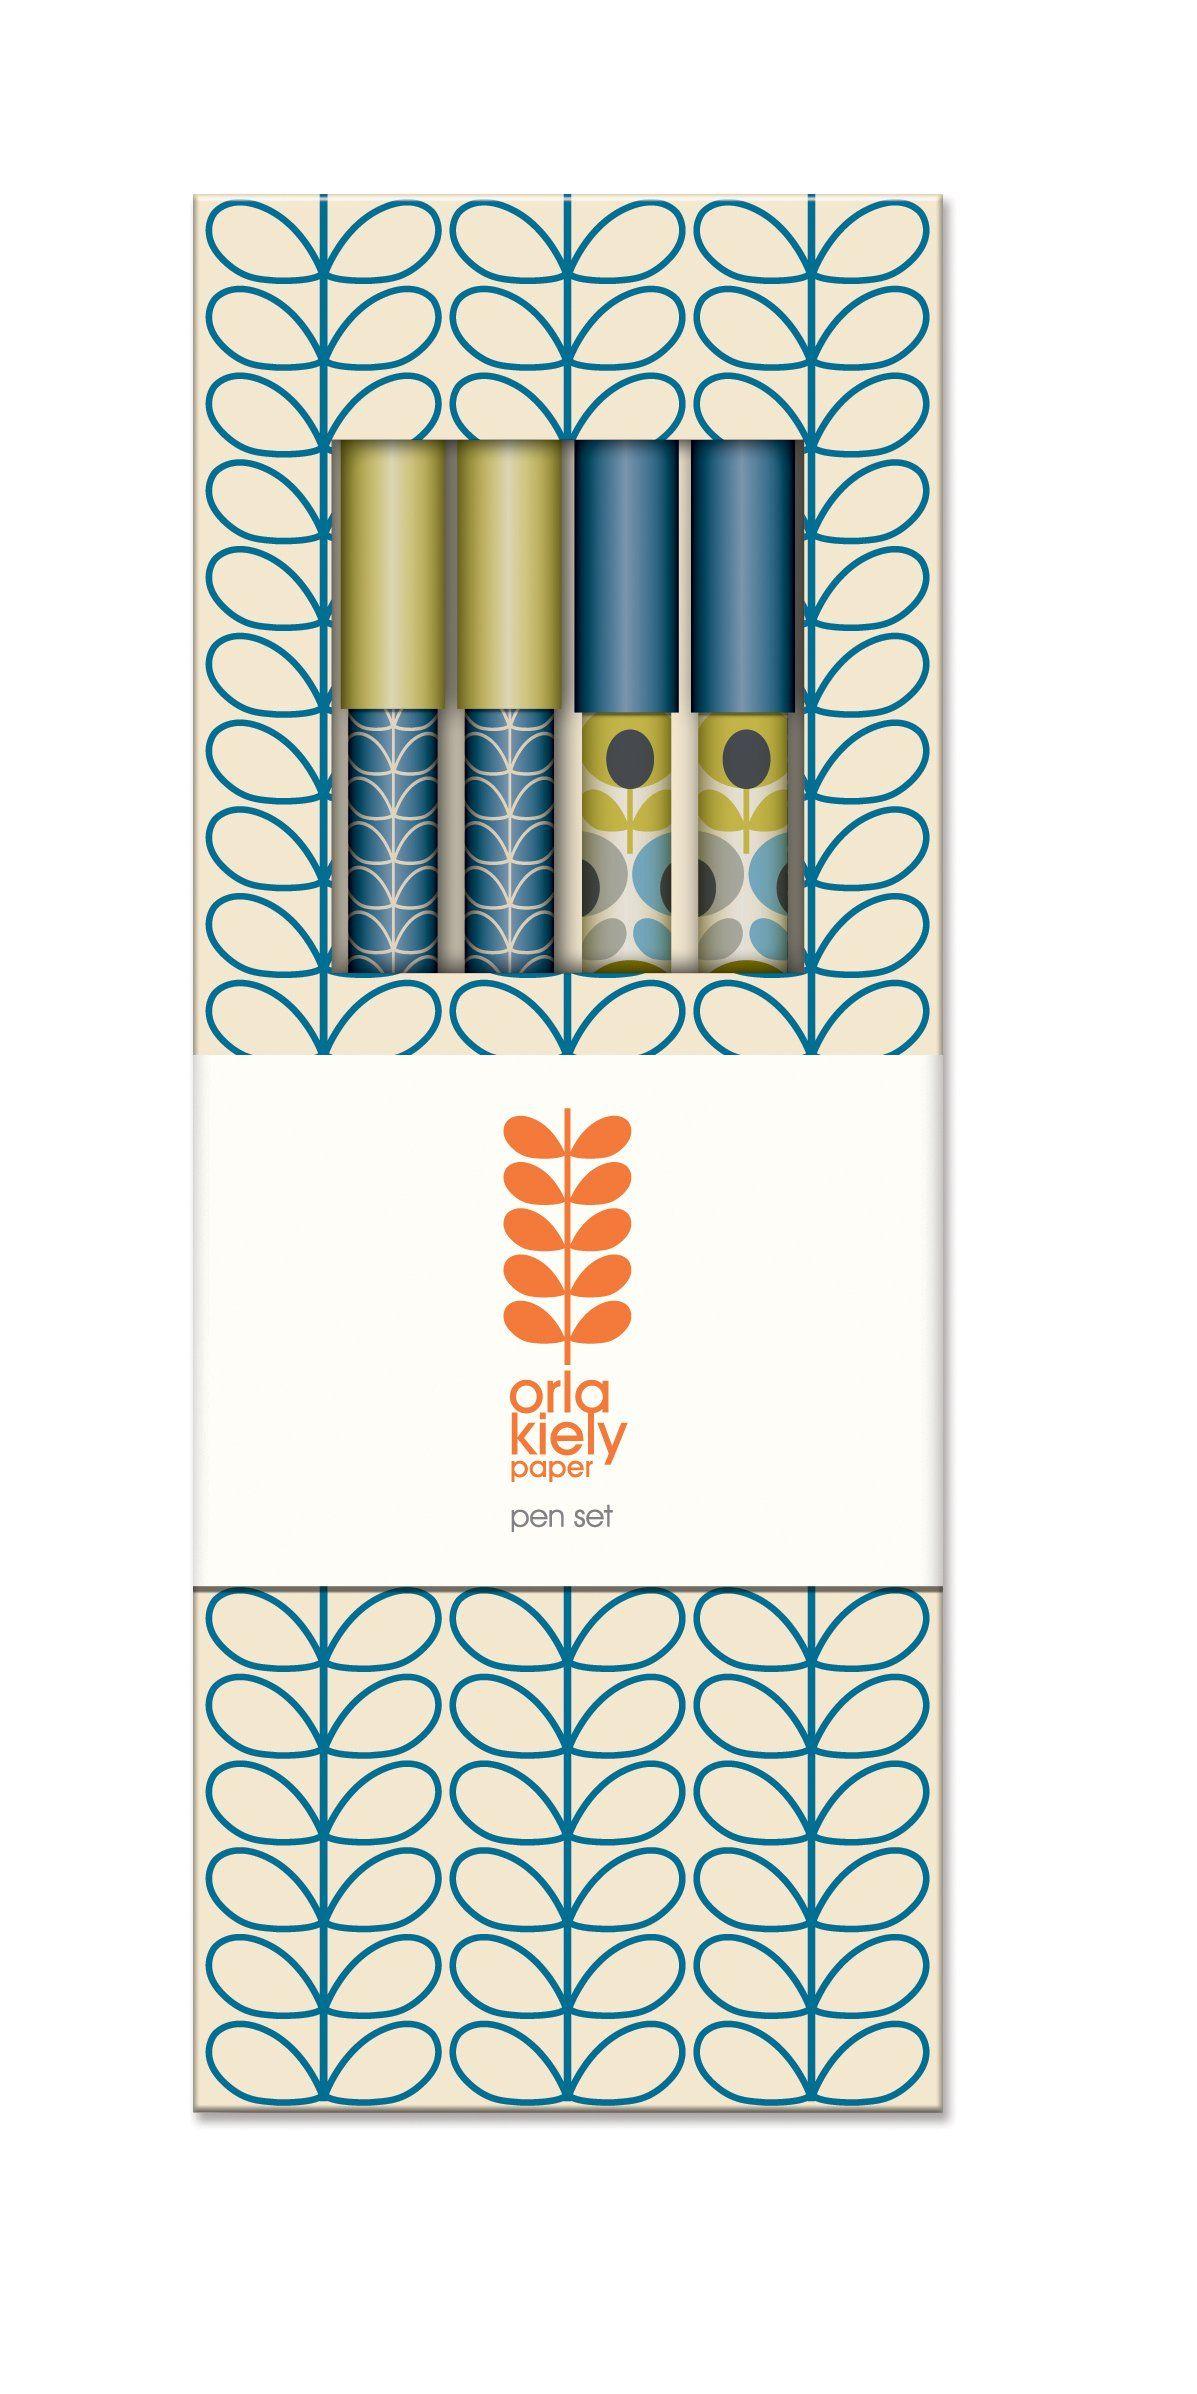 Orla kiely linear stem marine paper pen set box of orla kiely